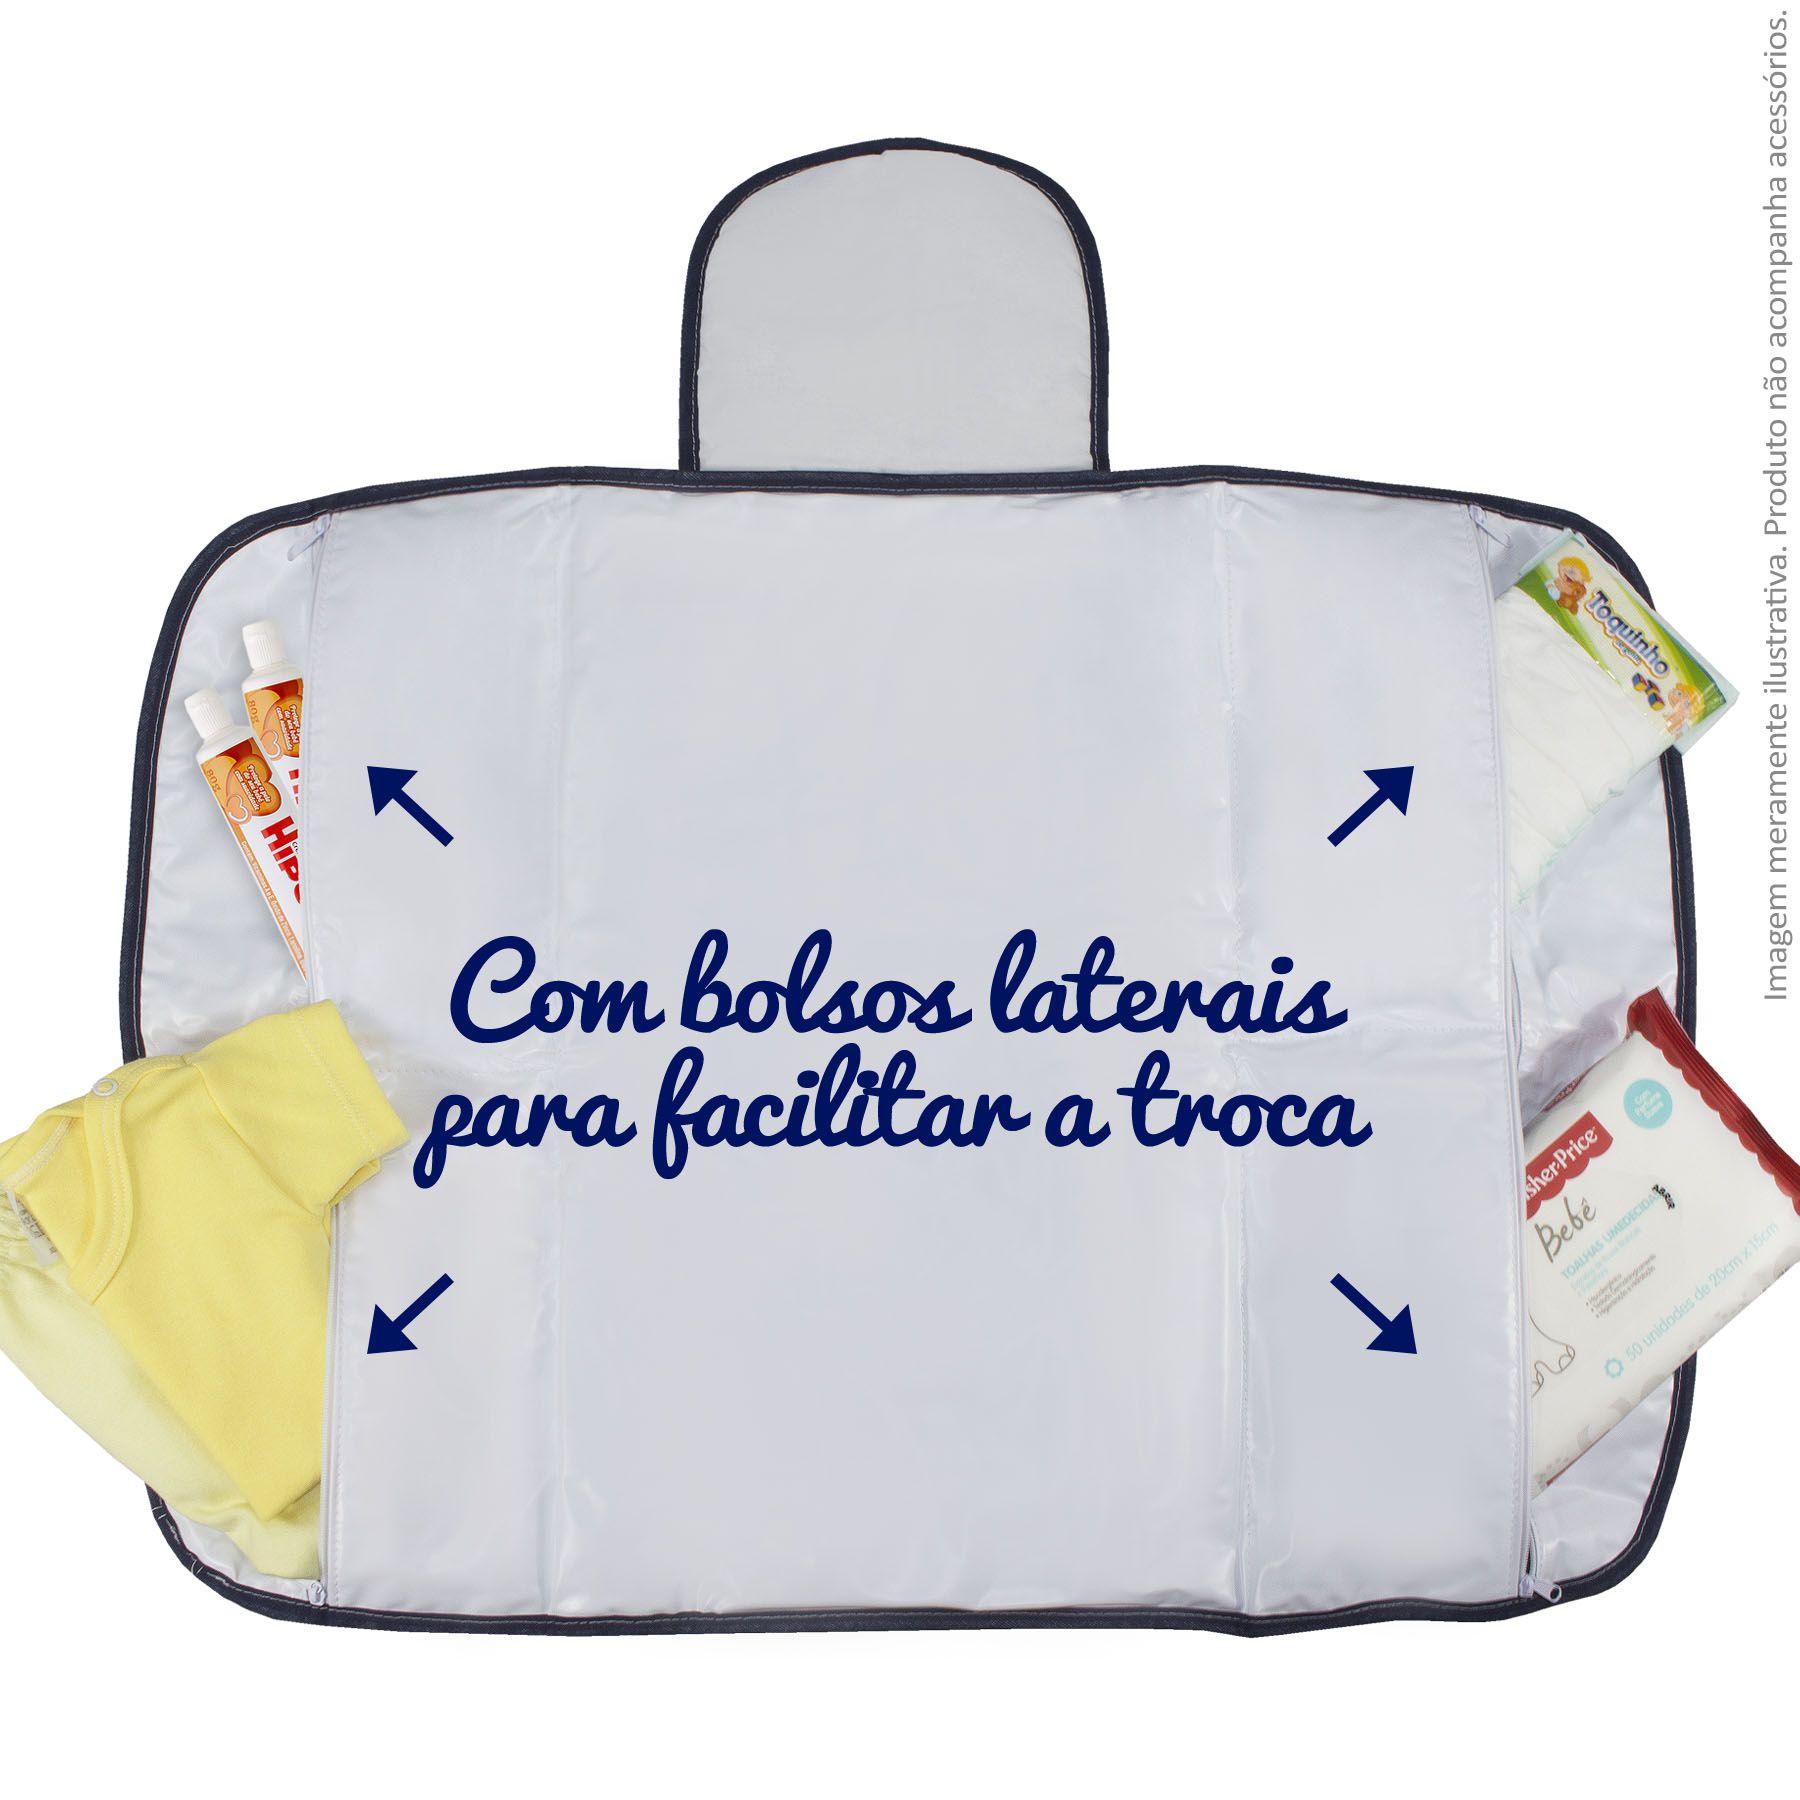 Trocador Portátil c/ Bolsos - Losango Marinho